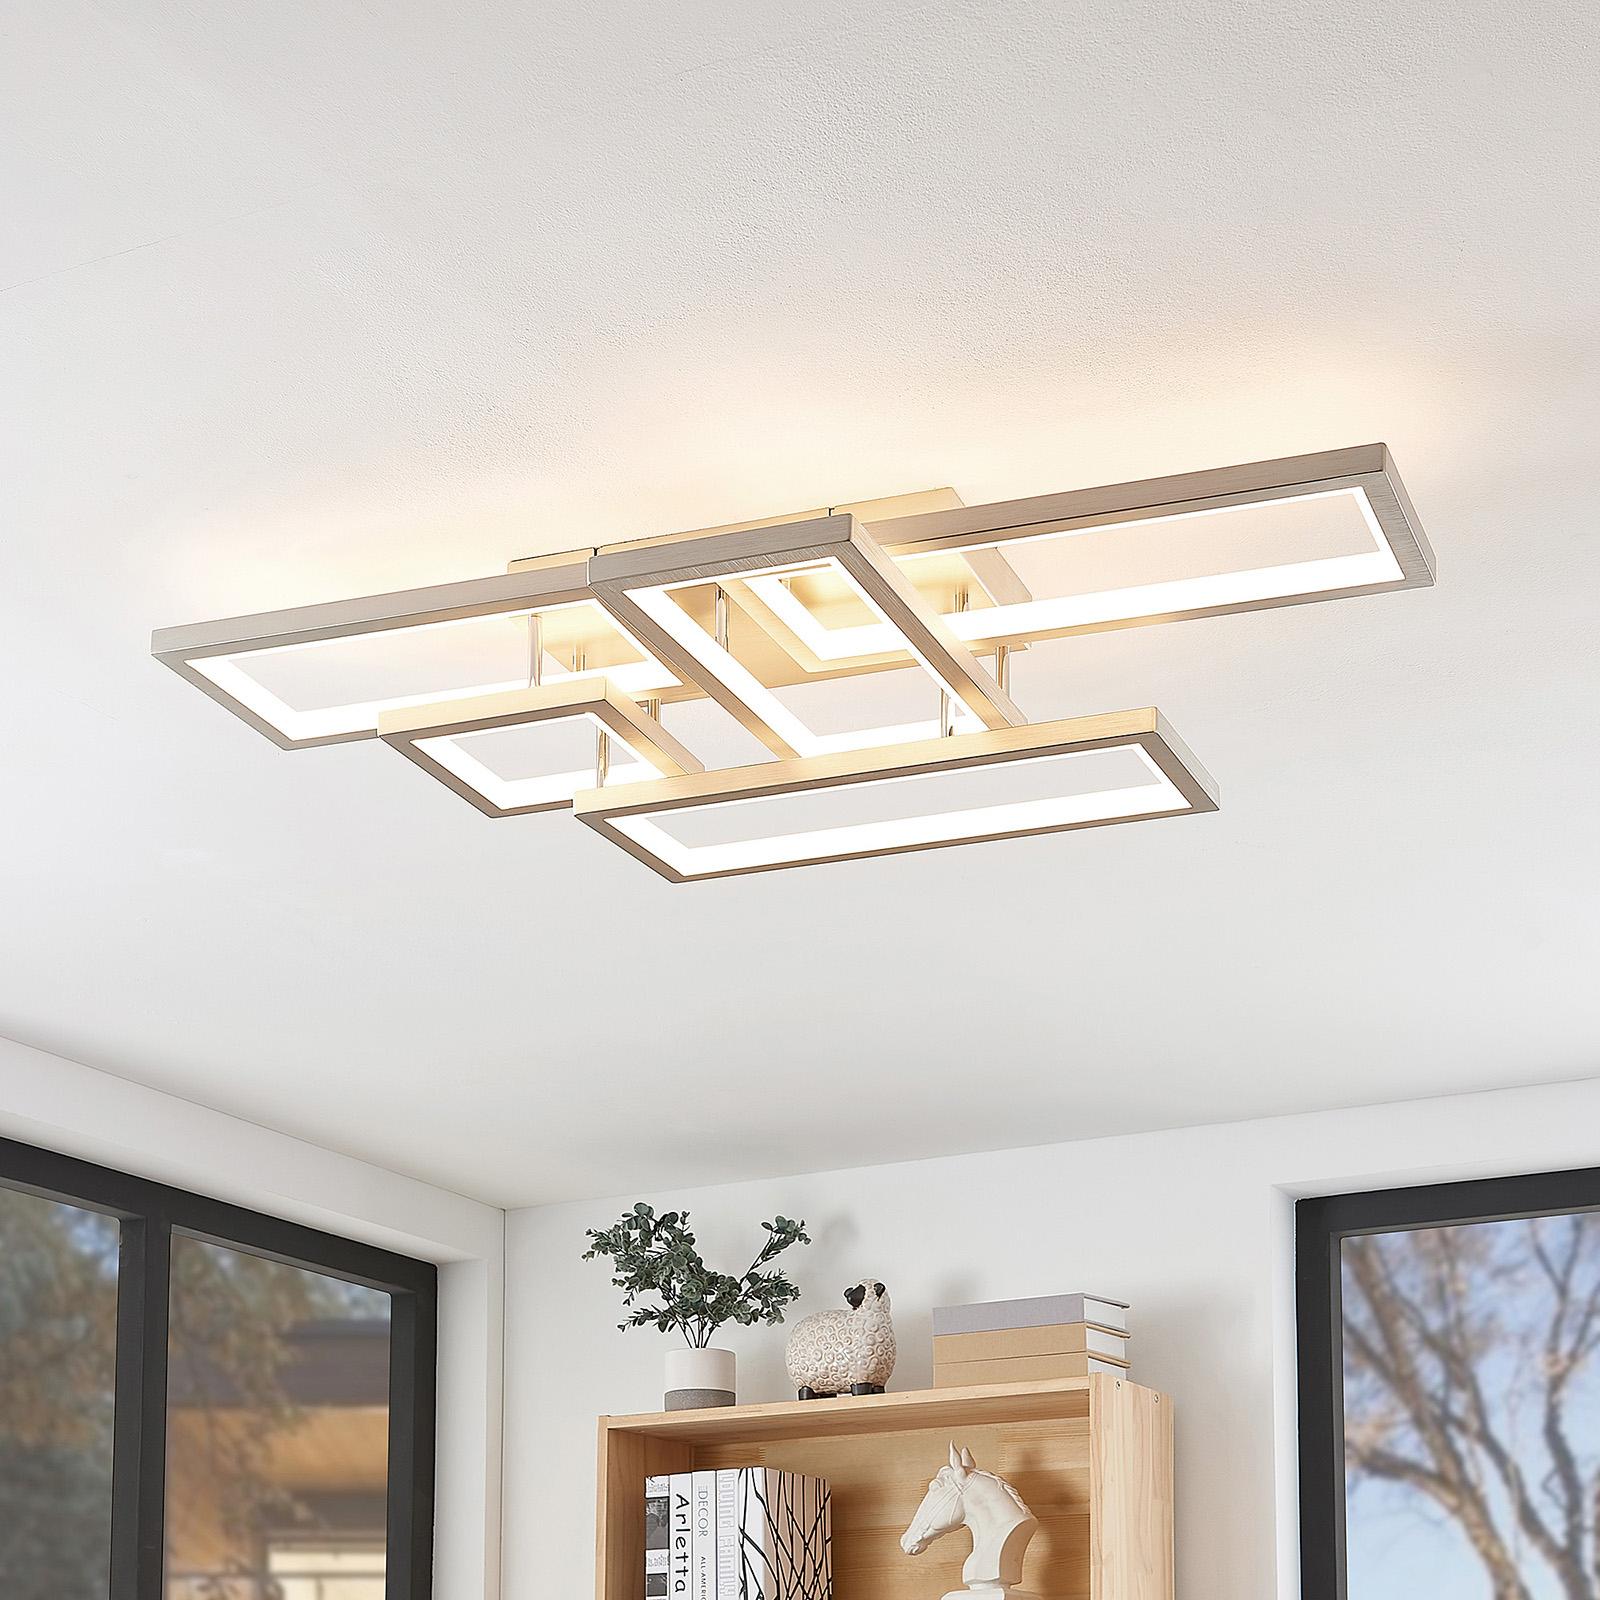 Lucande Avilara LED plafondlamp van alu., dimbaar